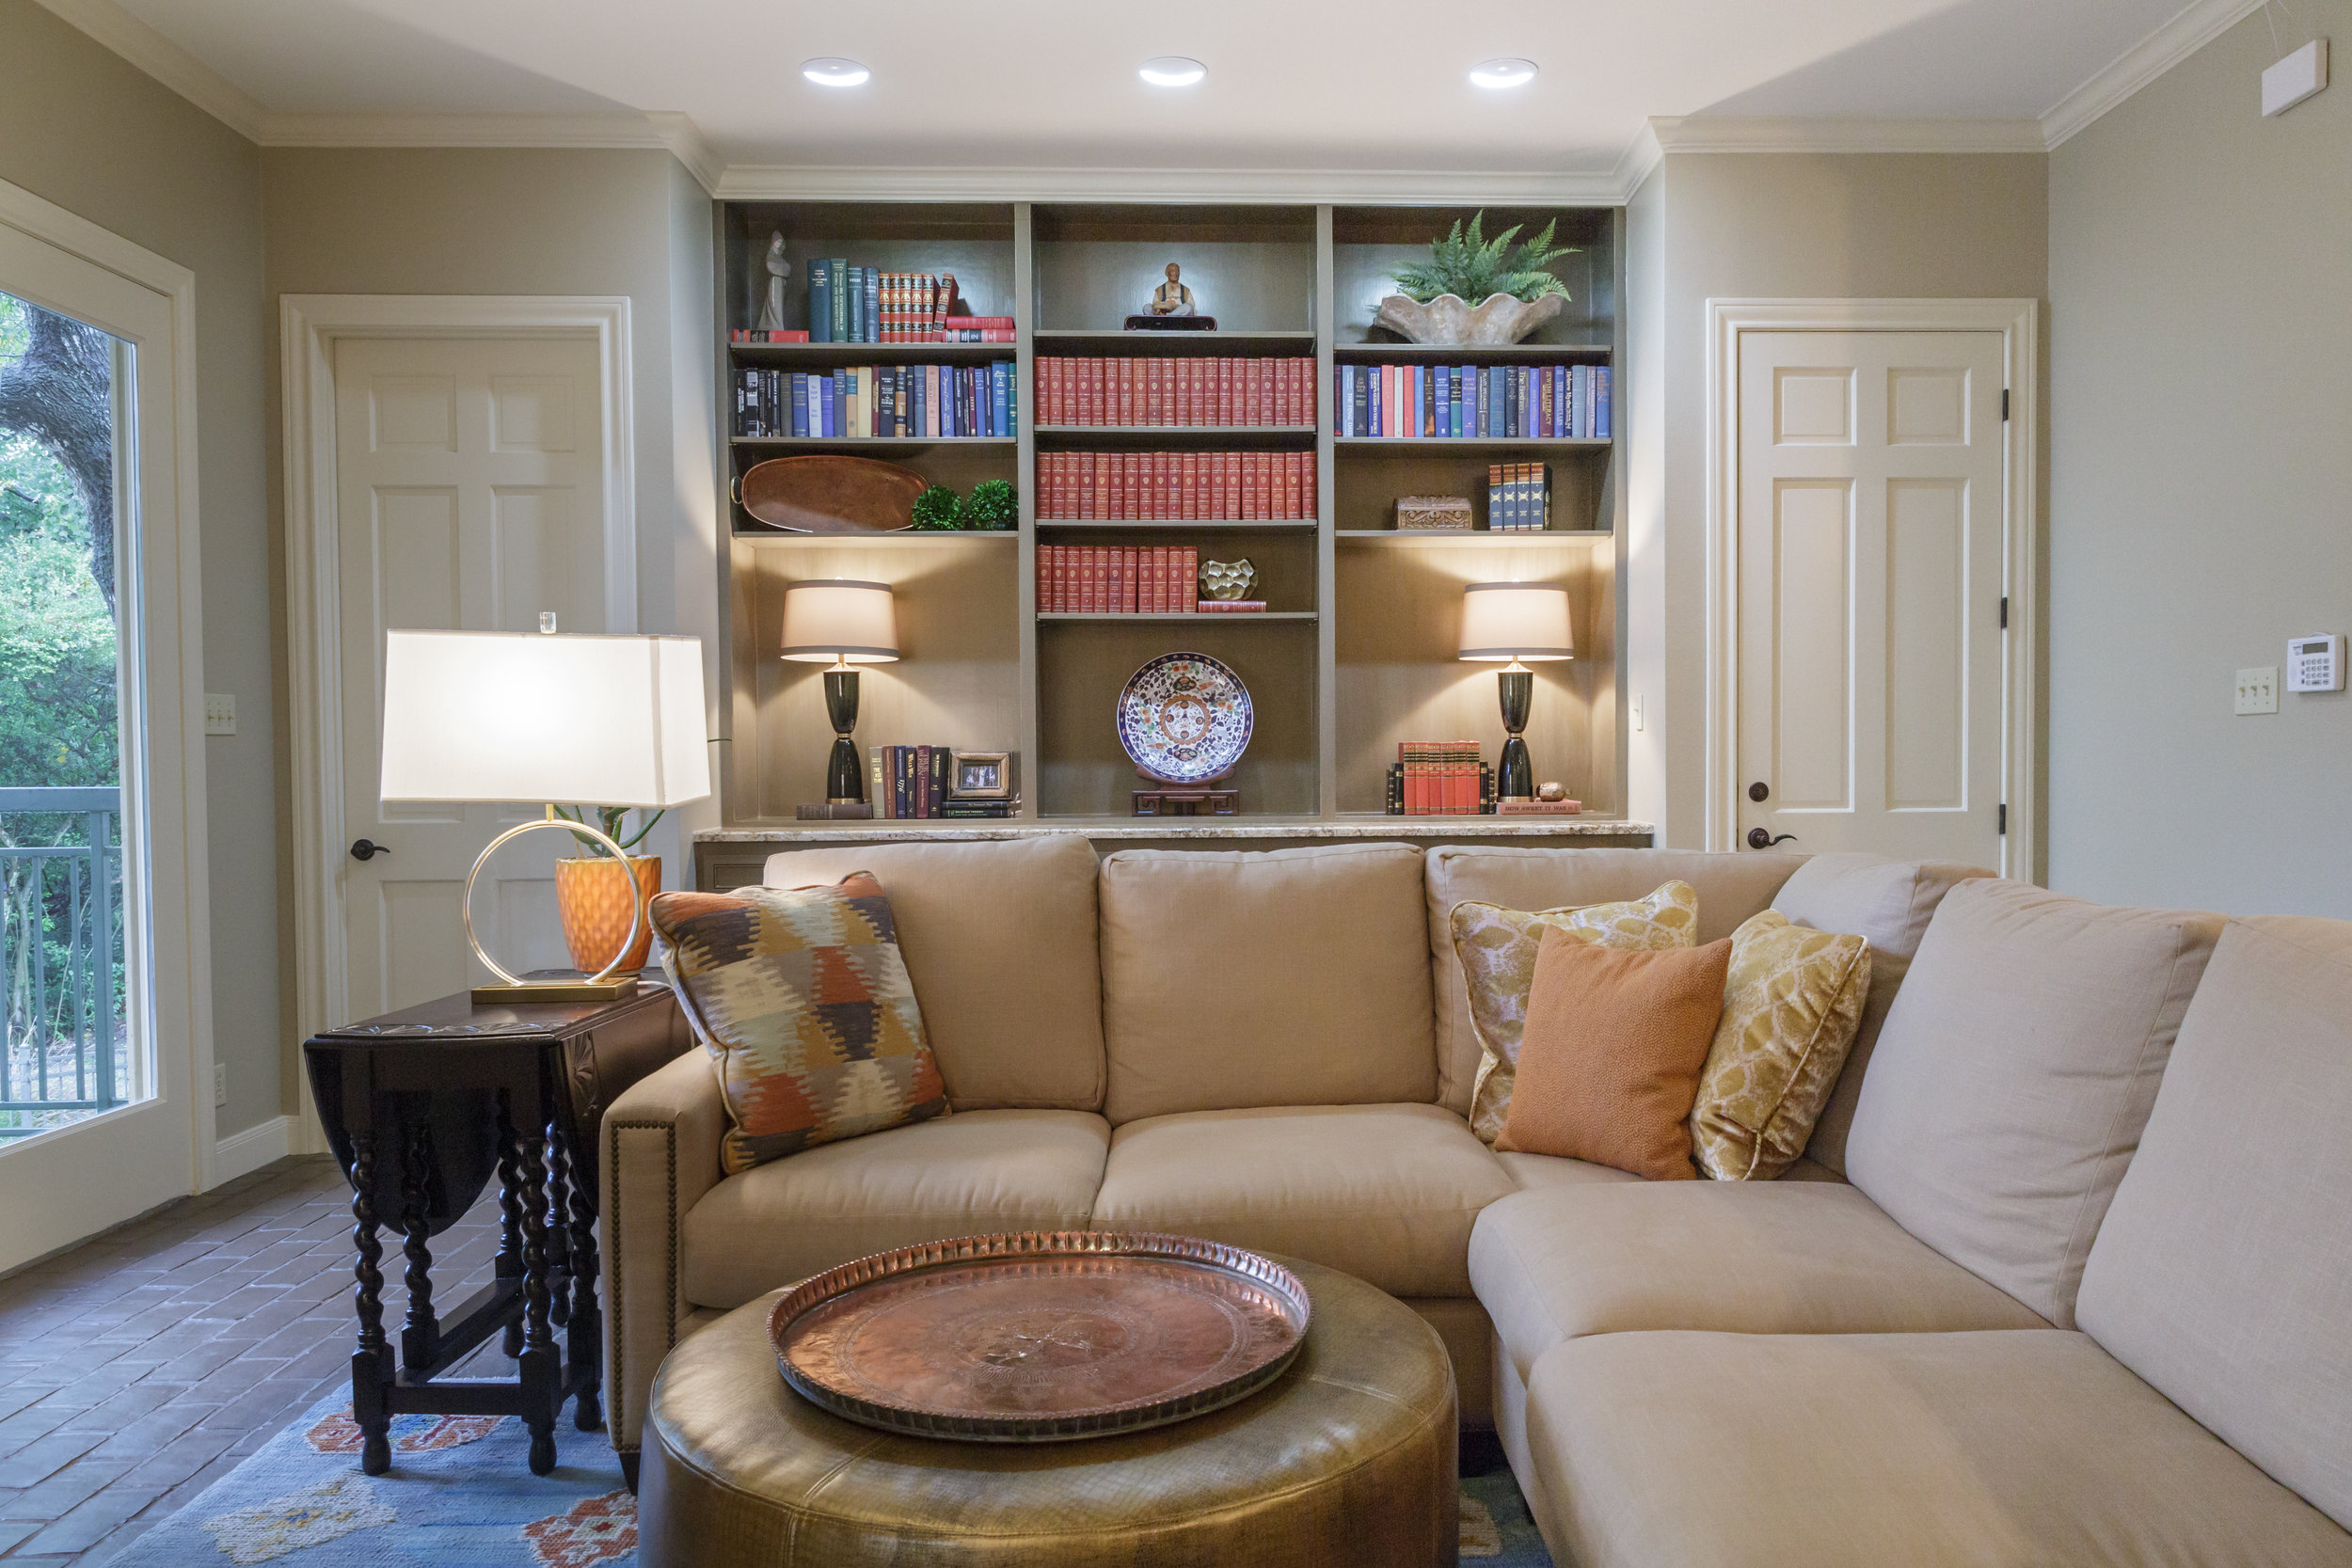 westlake living room